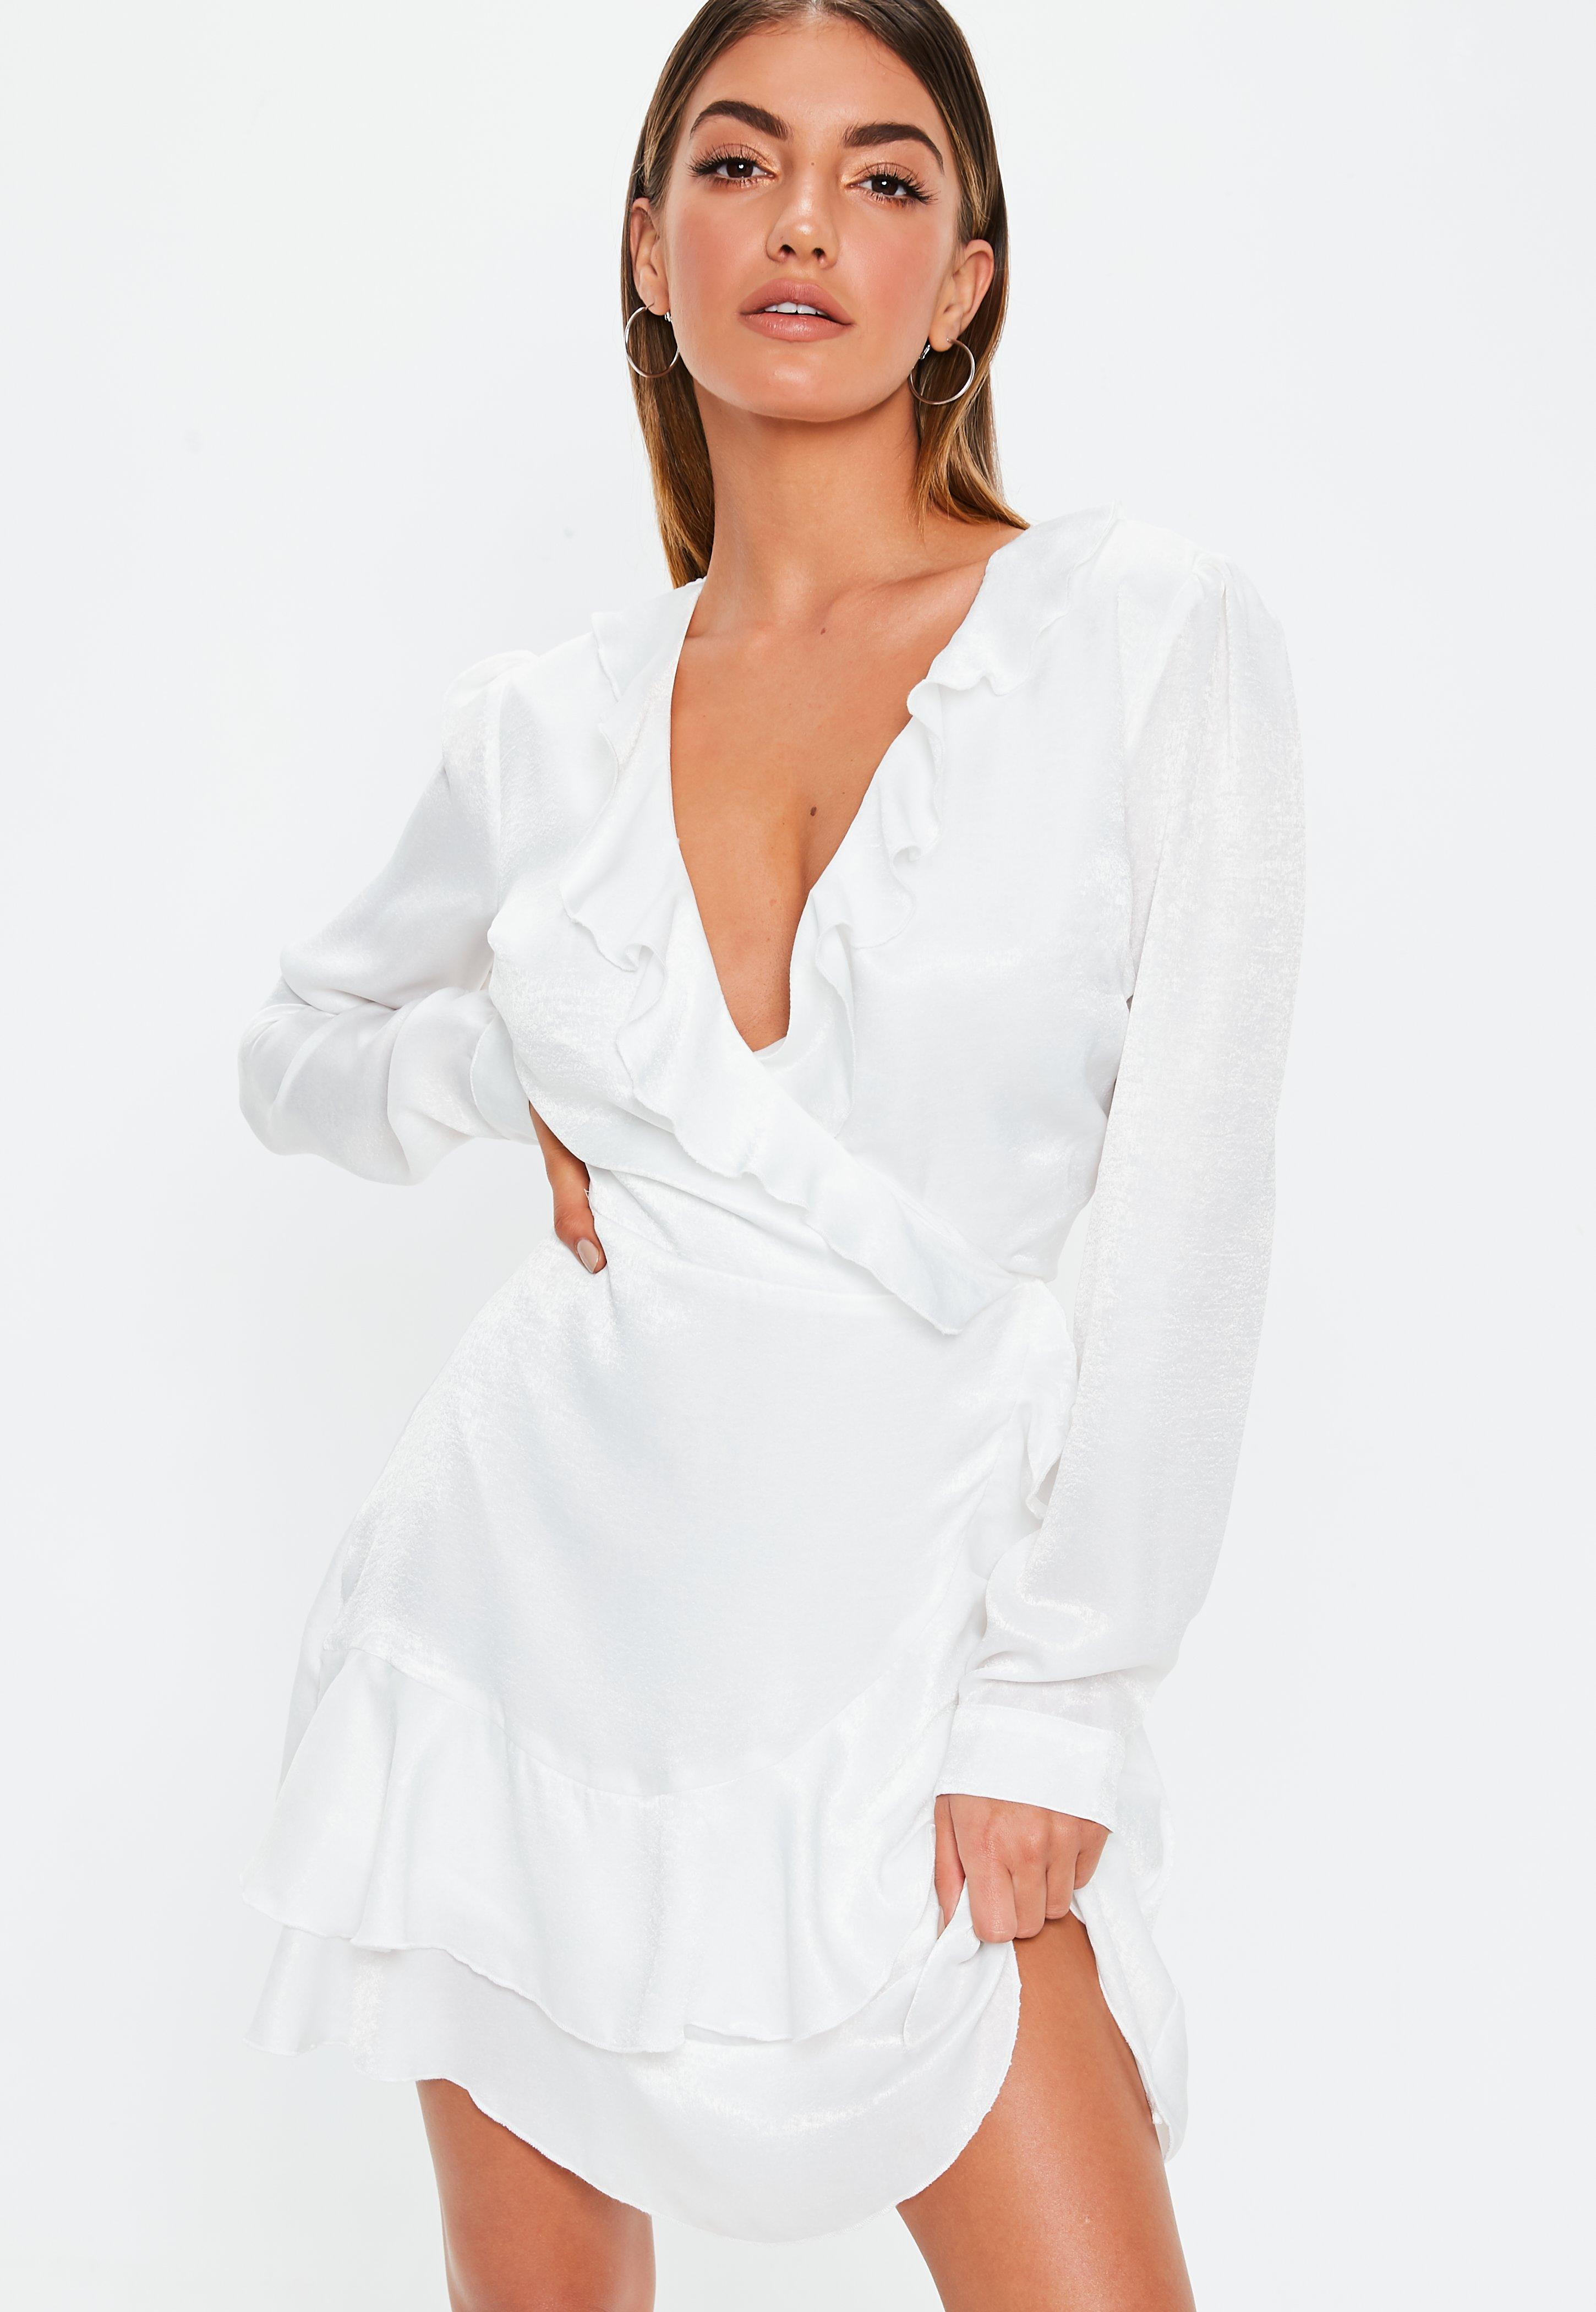 42a4da27f4 Tall Biała zawijana sukienka z falbankami